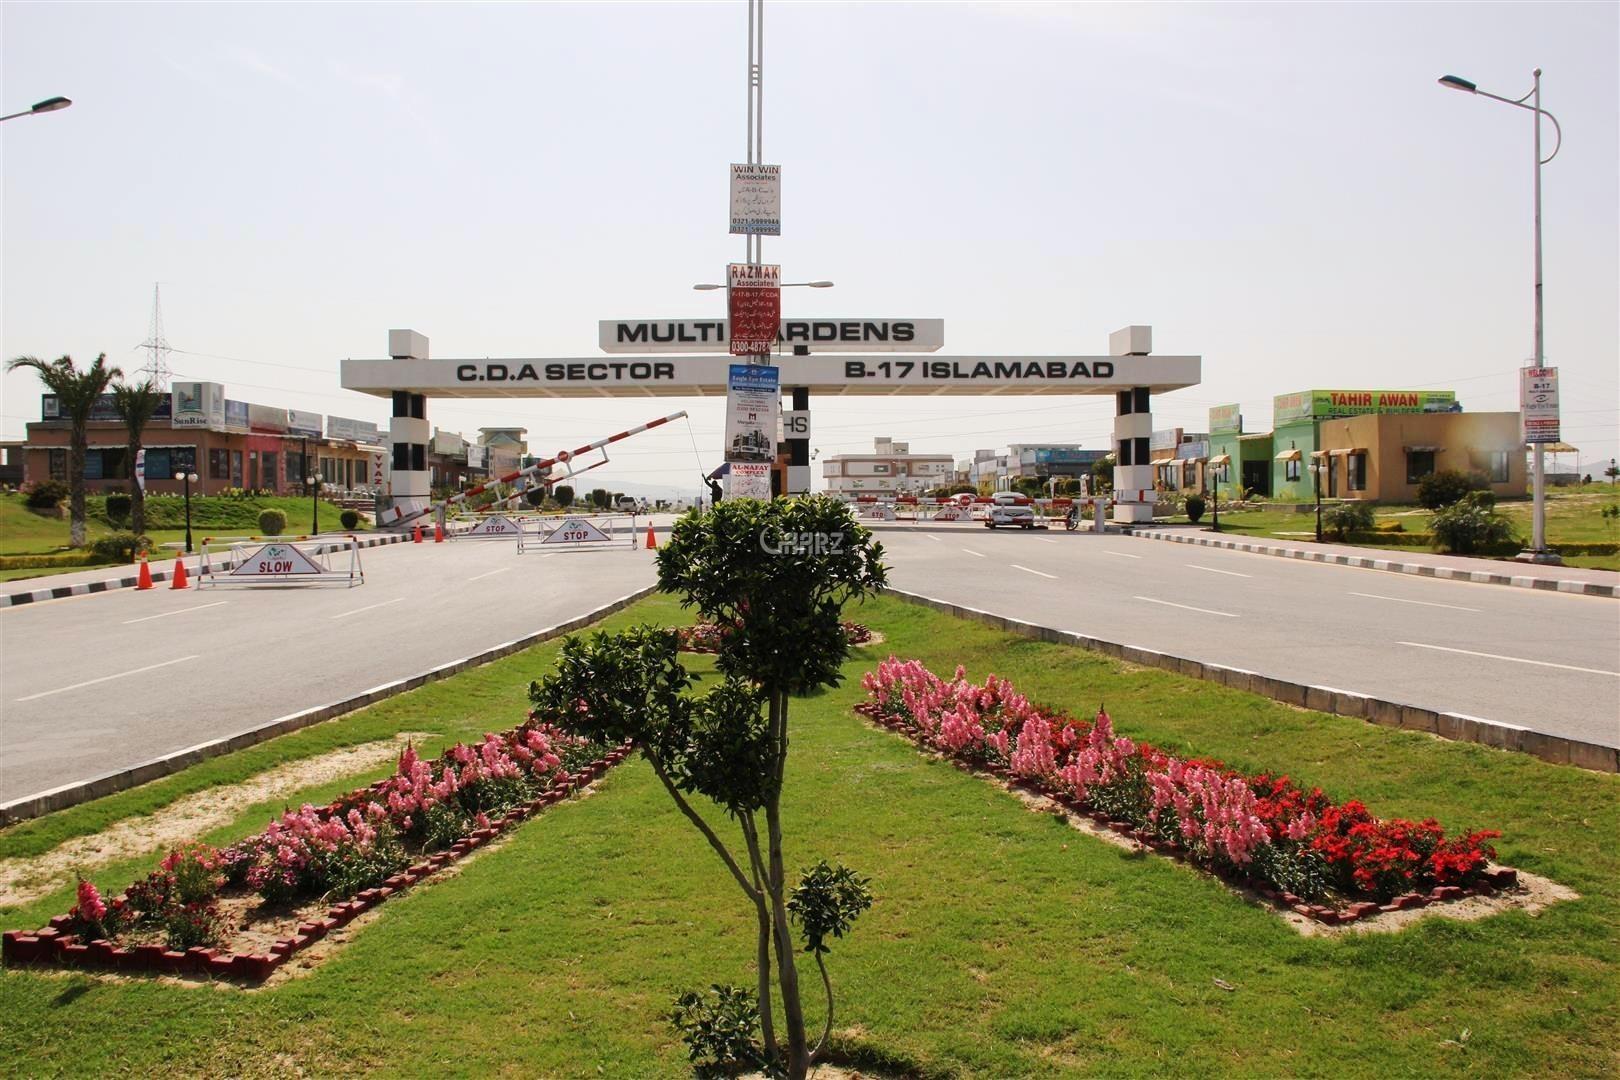 12 Marla Plot in B-17 Block-C1, Islamabad for Sale